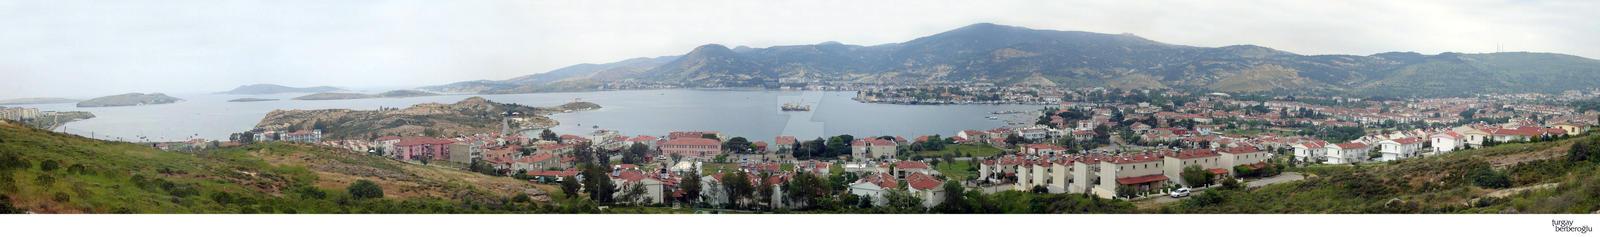 Izmir - Foca - Sea by uberdream